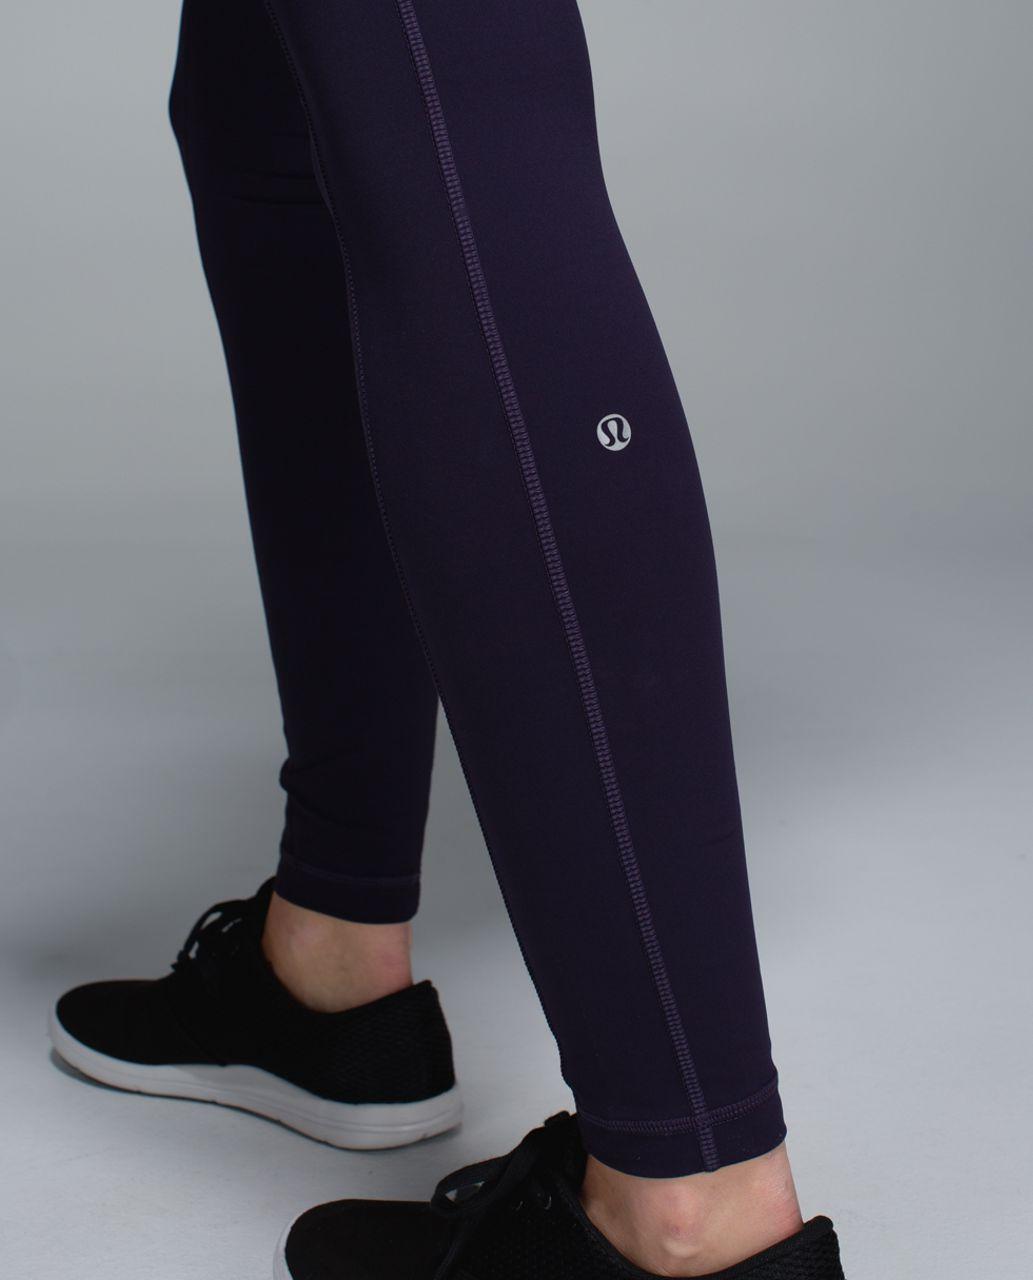 Lululemon Speed Tight ll *Full-On Luxtreme (Brushed) - Black Grape / Wee Stripe Black Grape Heathered Black Grape